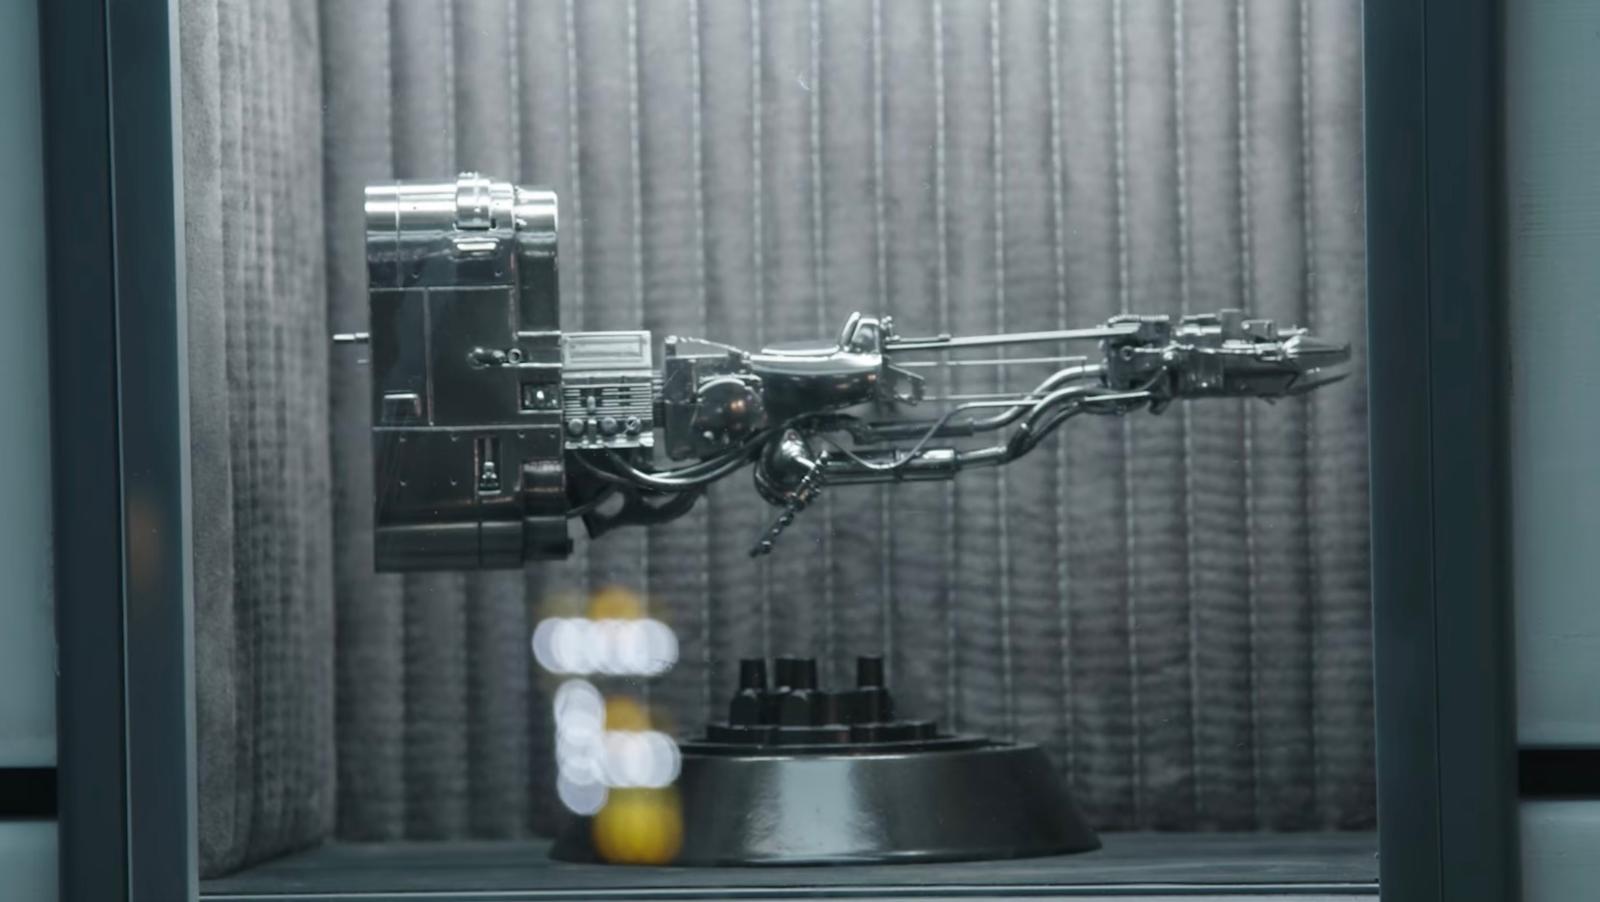 A curious treasure on Lando's Falcon that looks like a podracer.